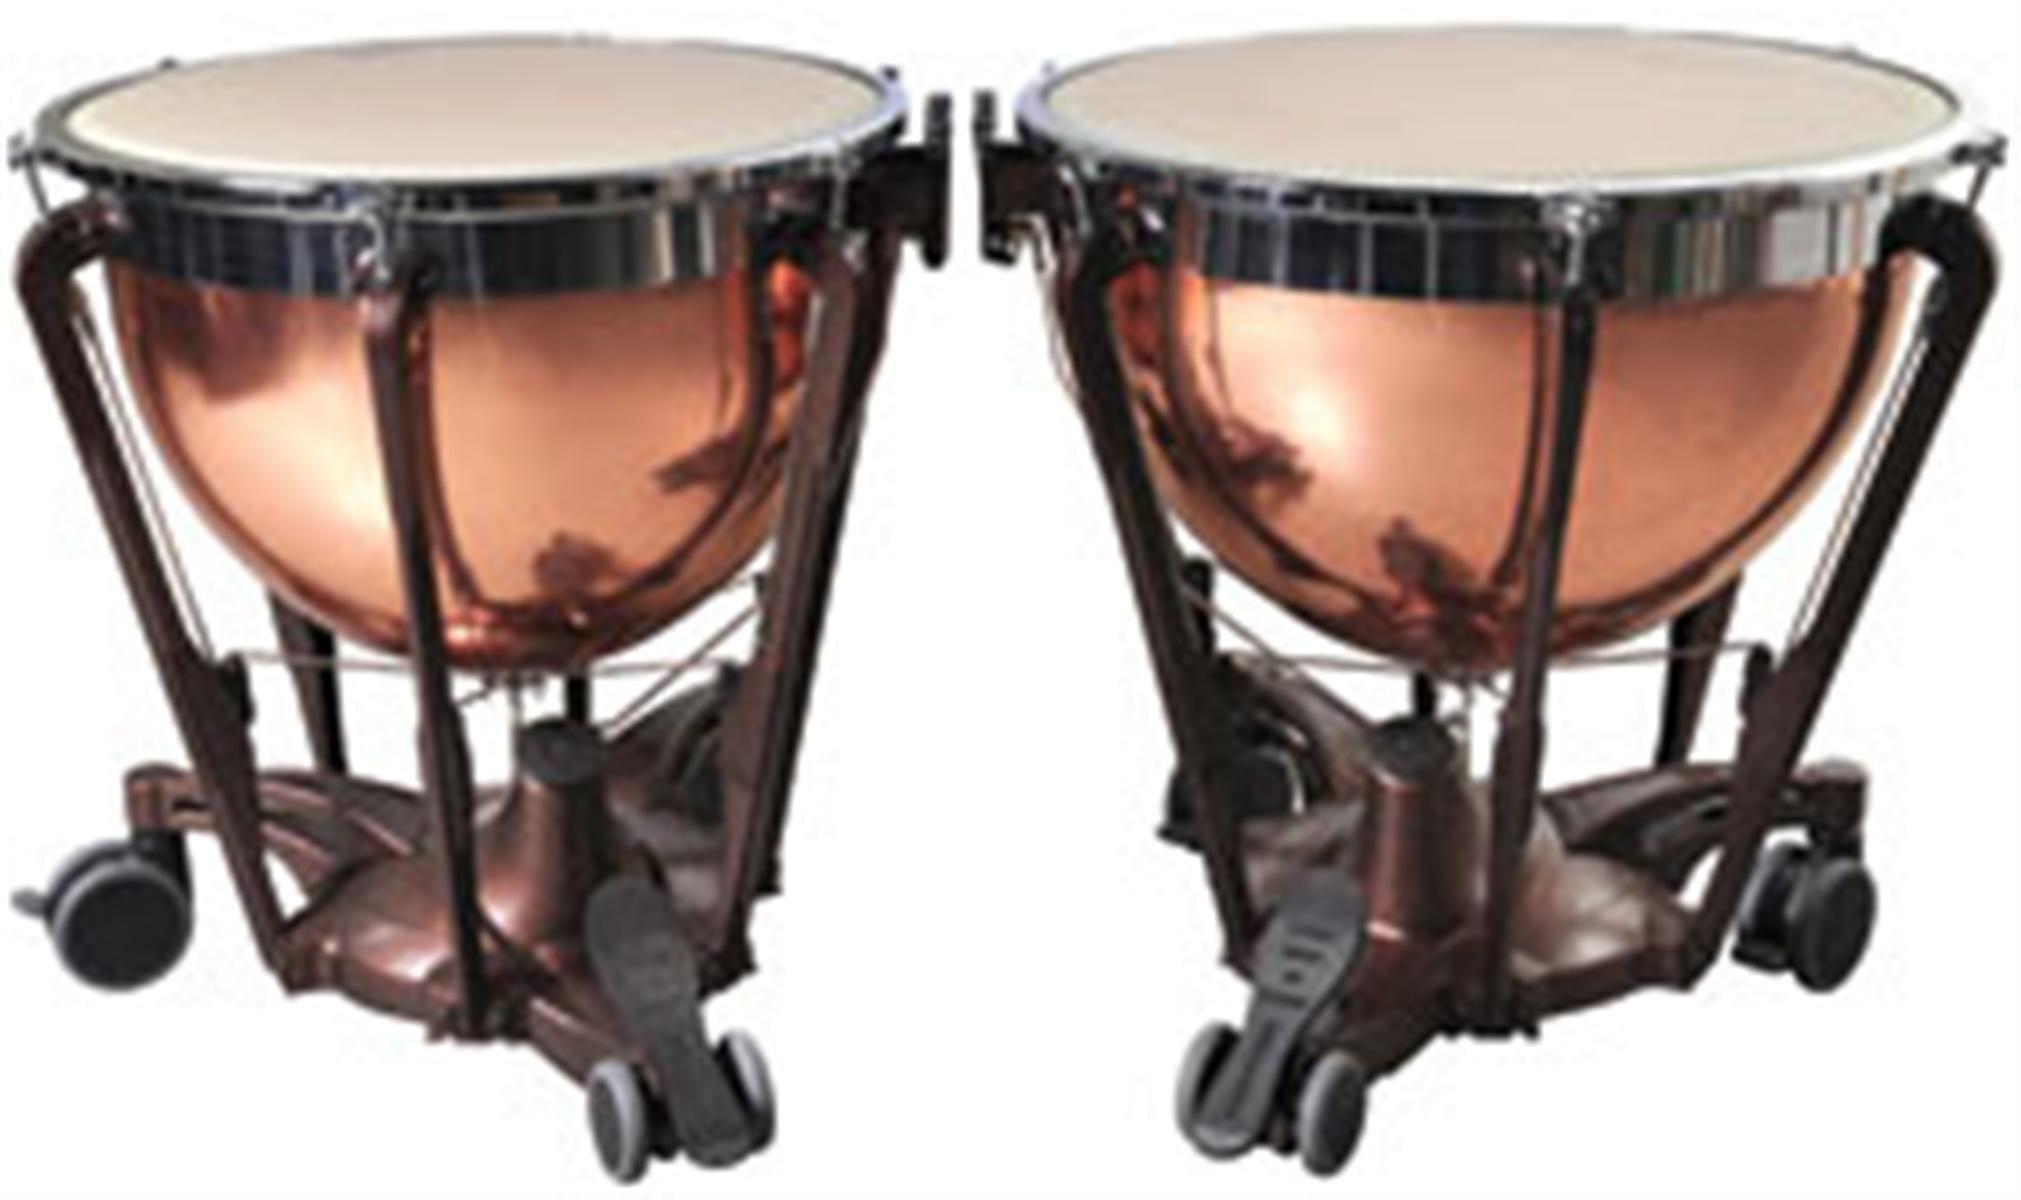 Adams Professional Gen Ii Smooth Copper Timpani Set 26 And 29